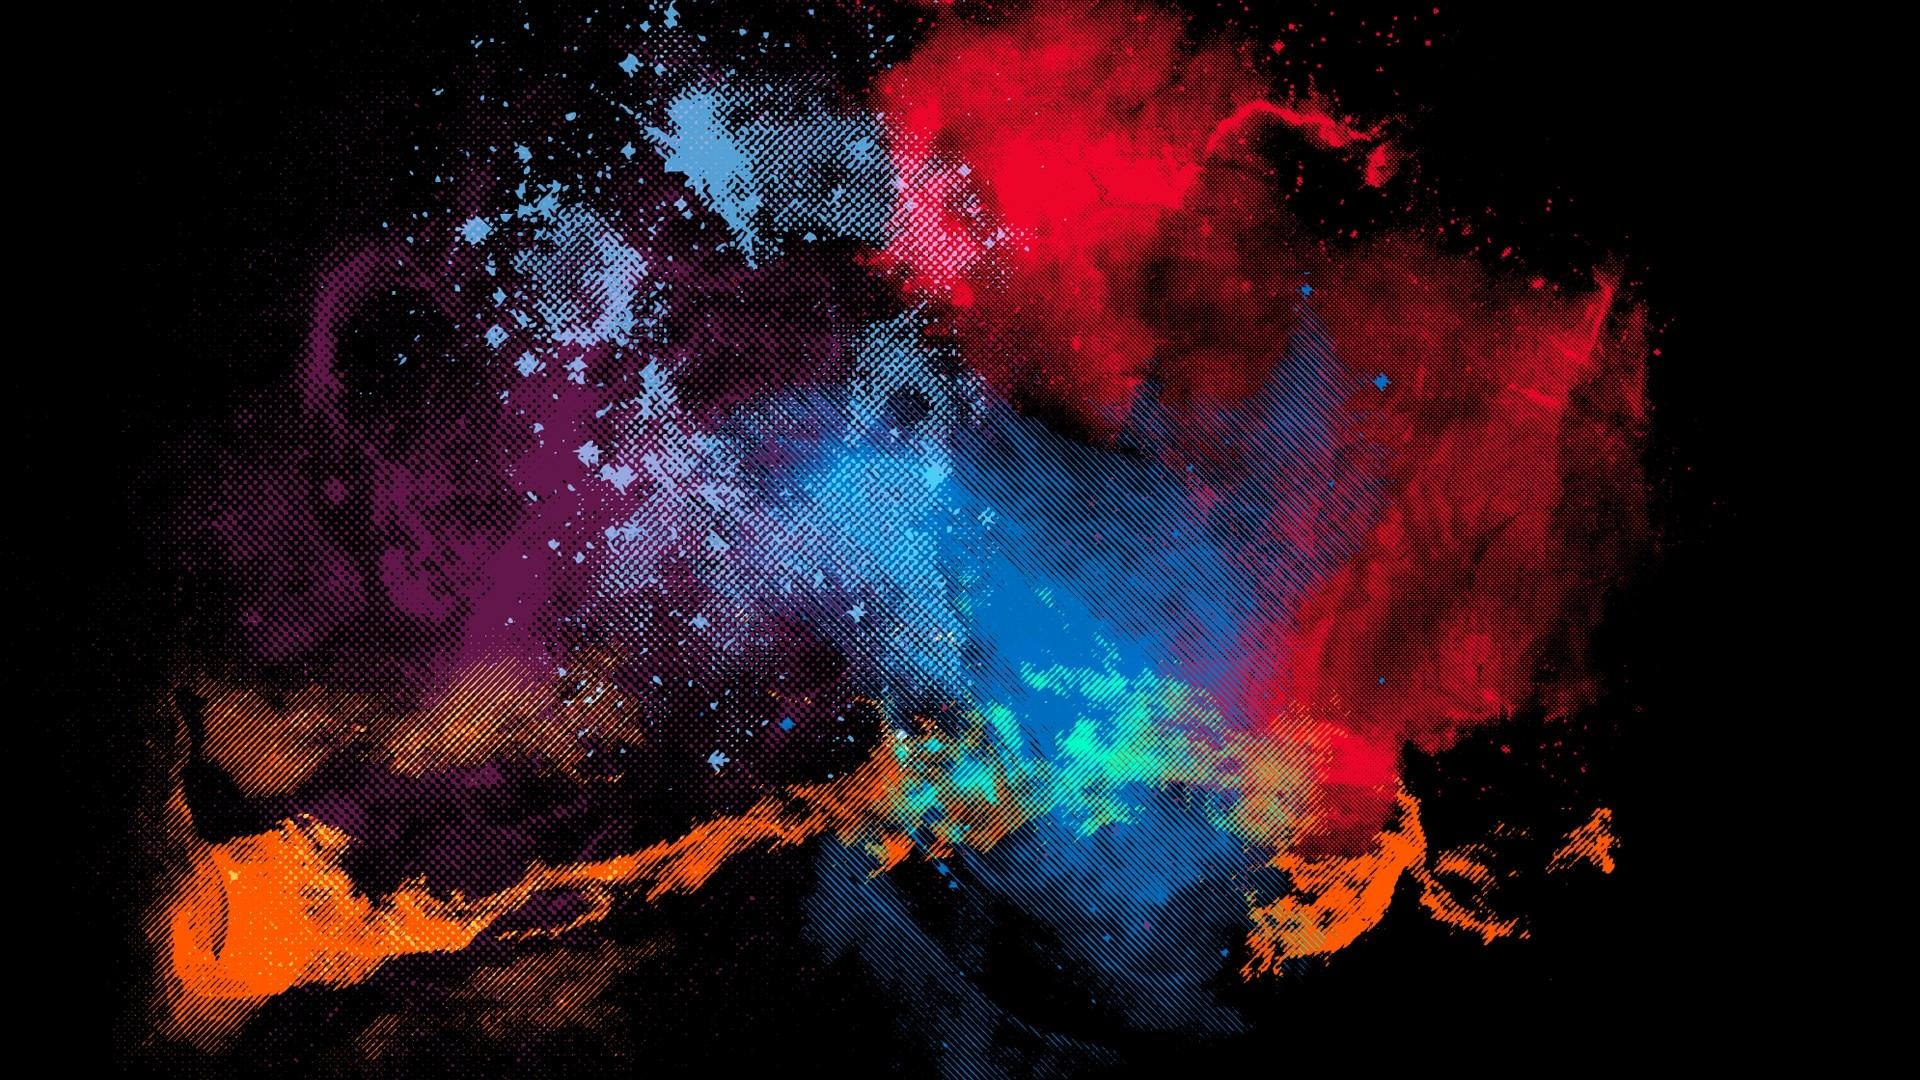 website gallery design photos high definition d stains